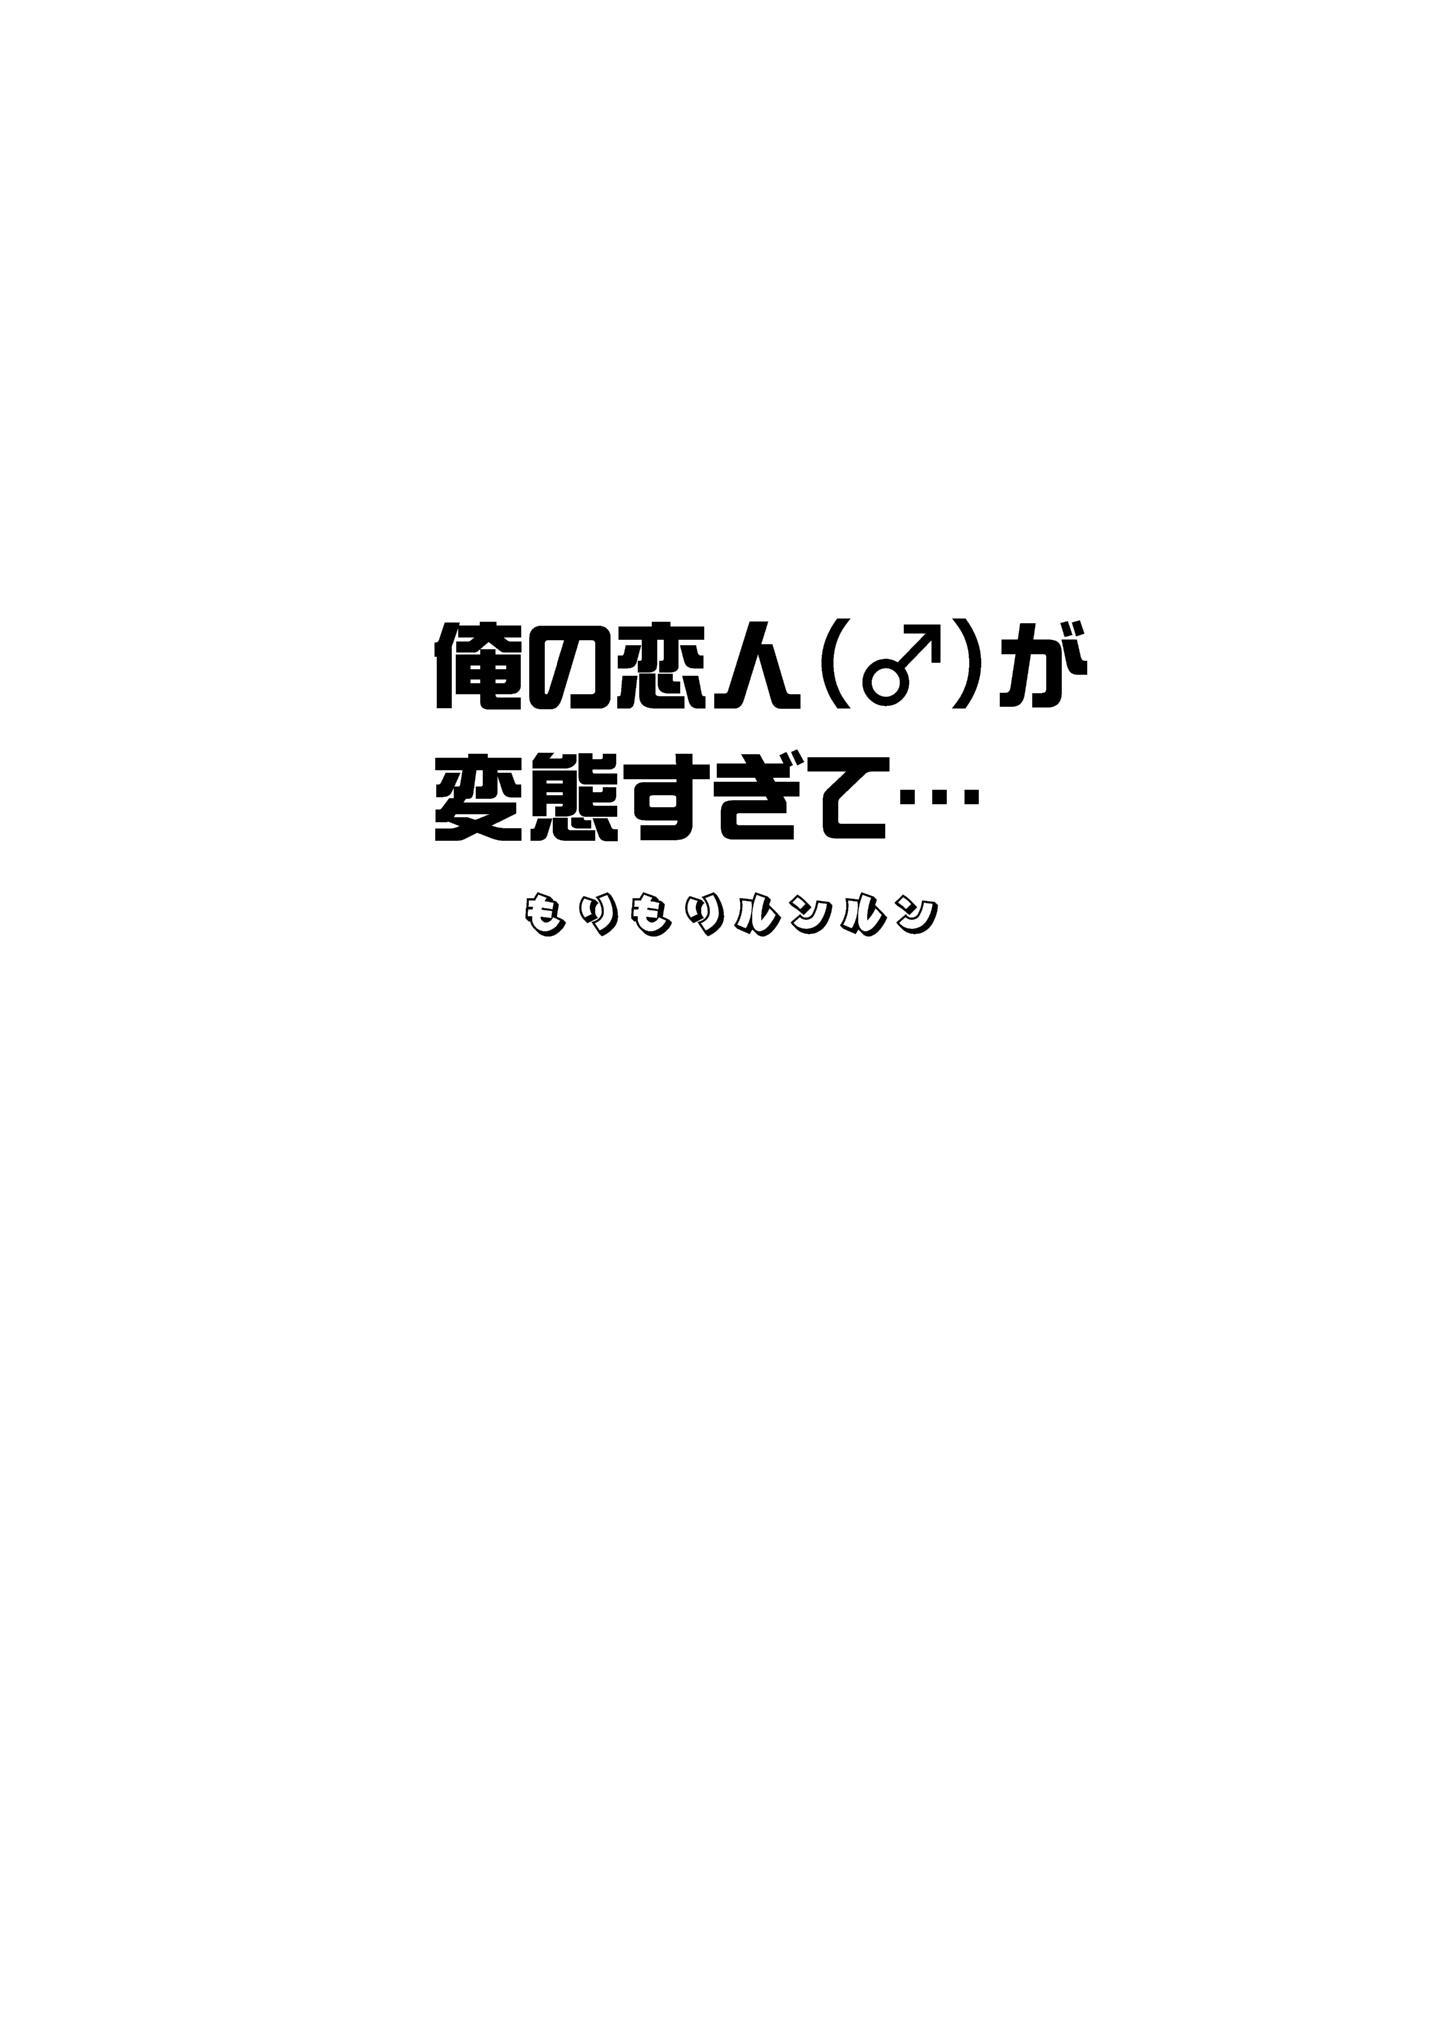 [ManbooRerere] Ore no Koibito (♂) ga Hentai Sugite… 9